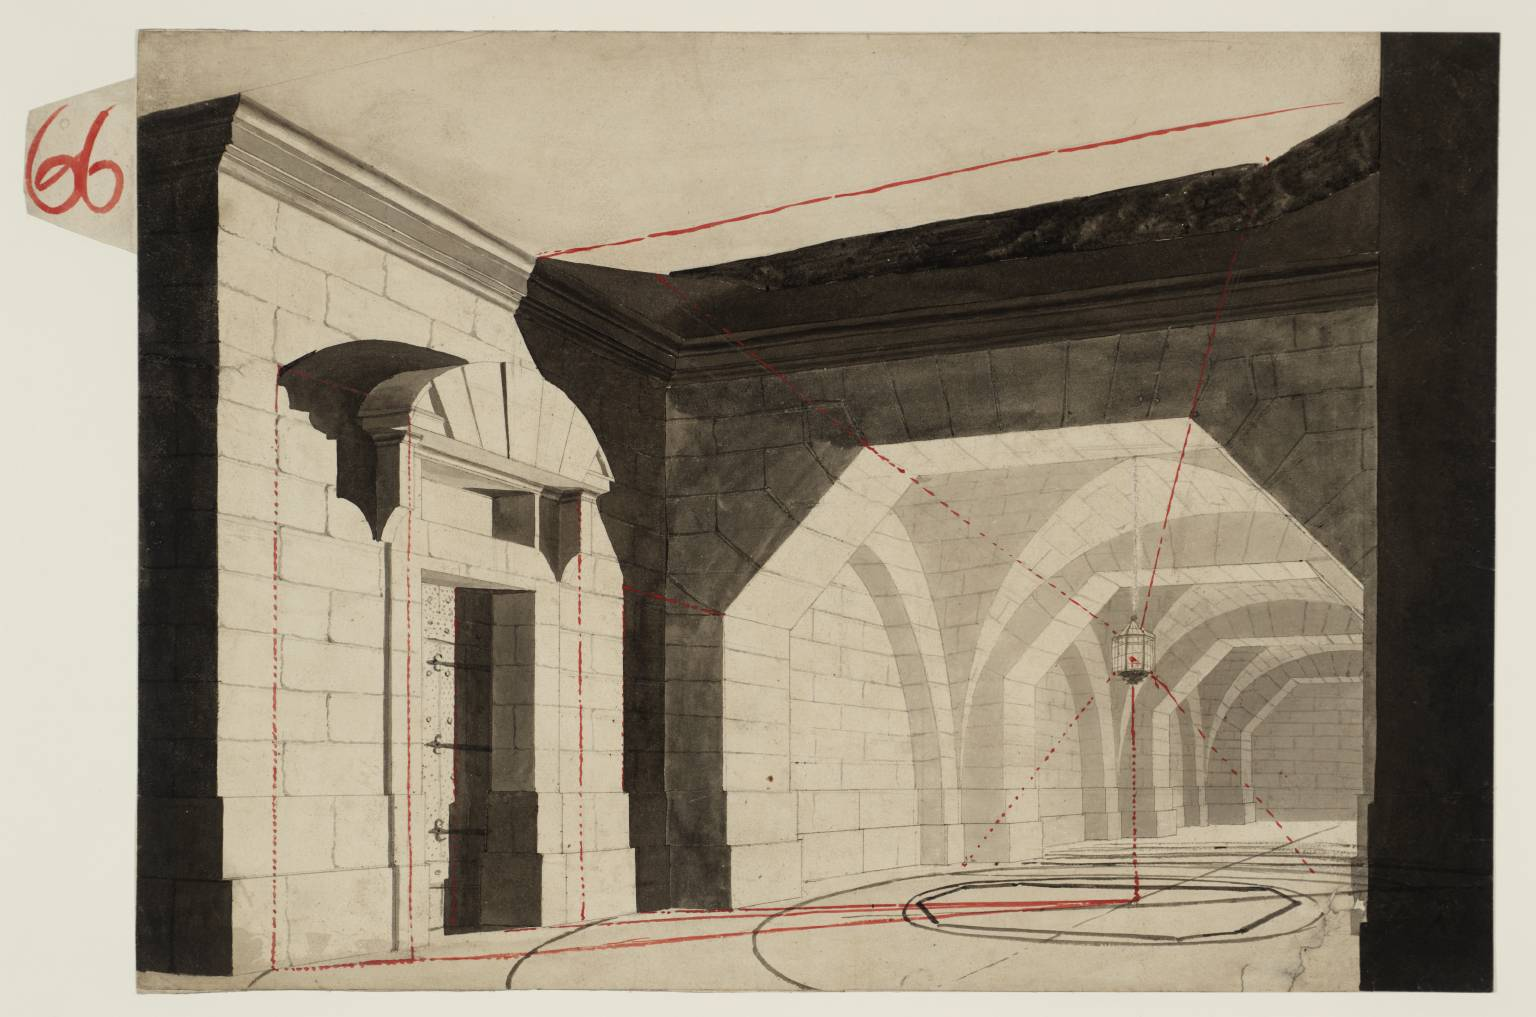 Prision Interior Piranesi.jpg